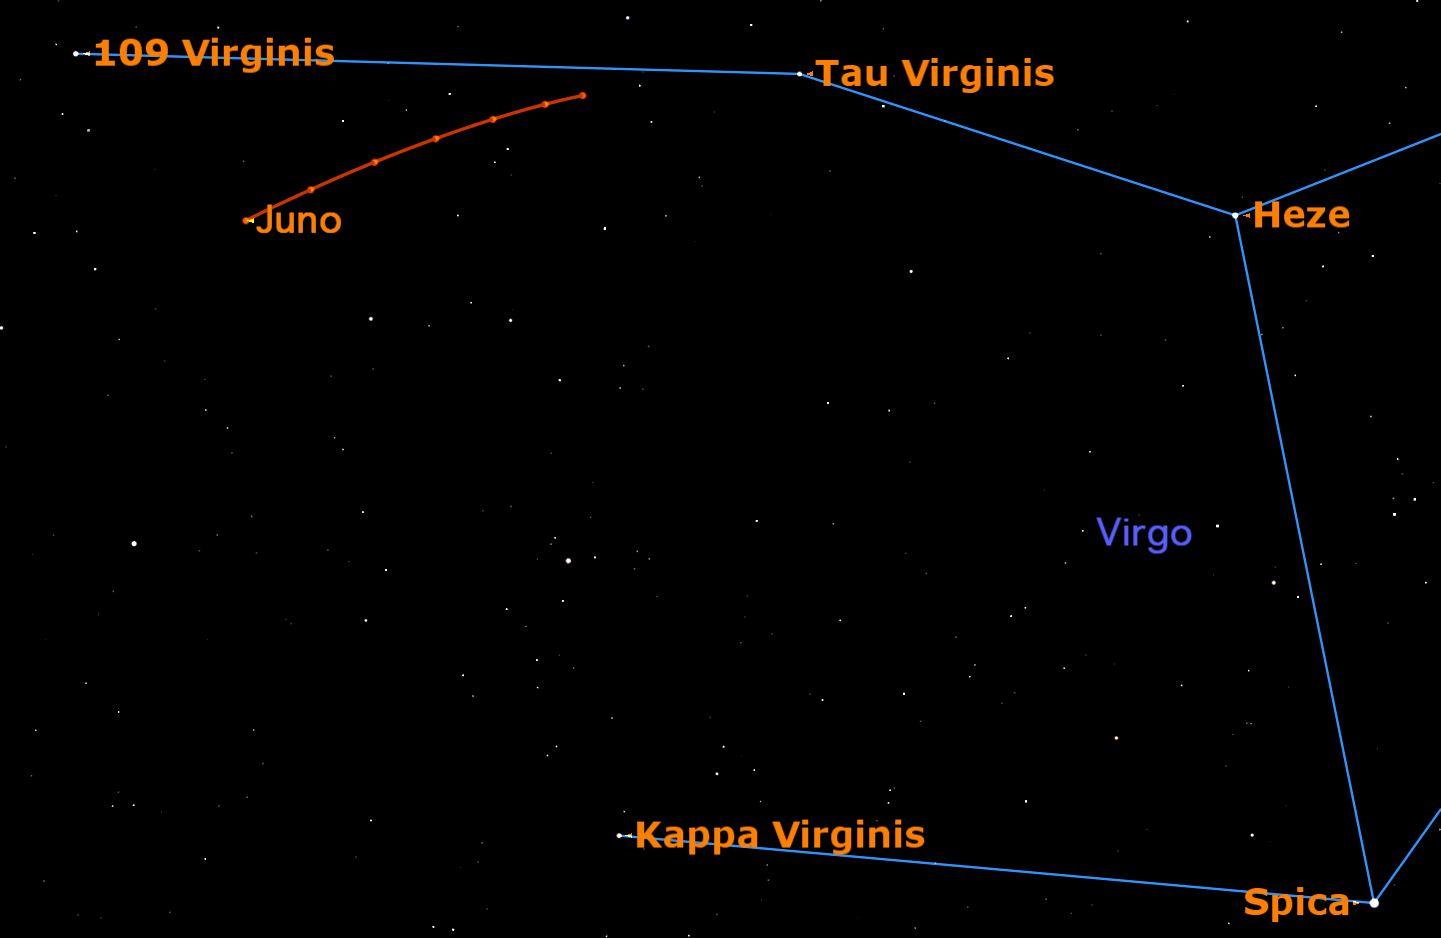 Spot Big Asteroid Juno in the Night Sky